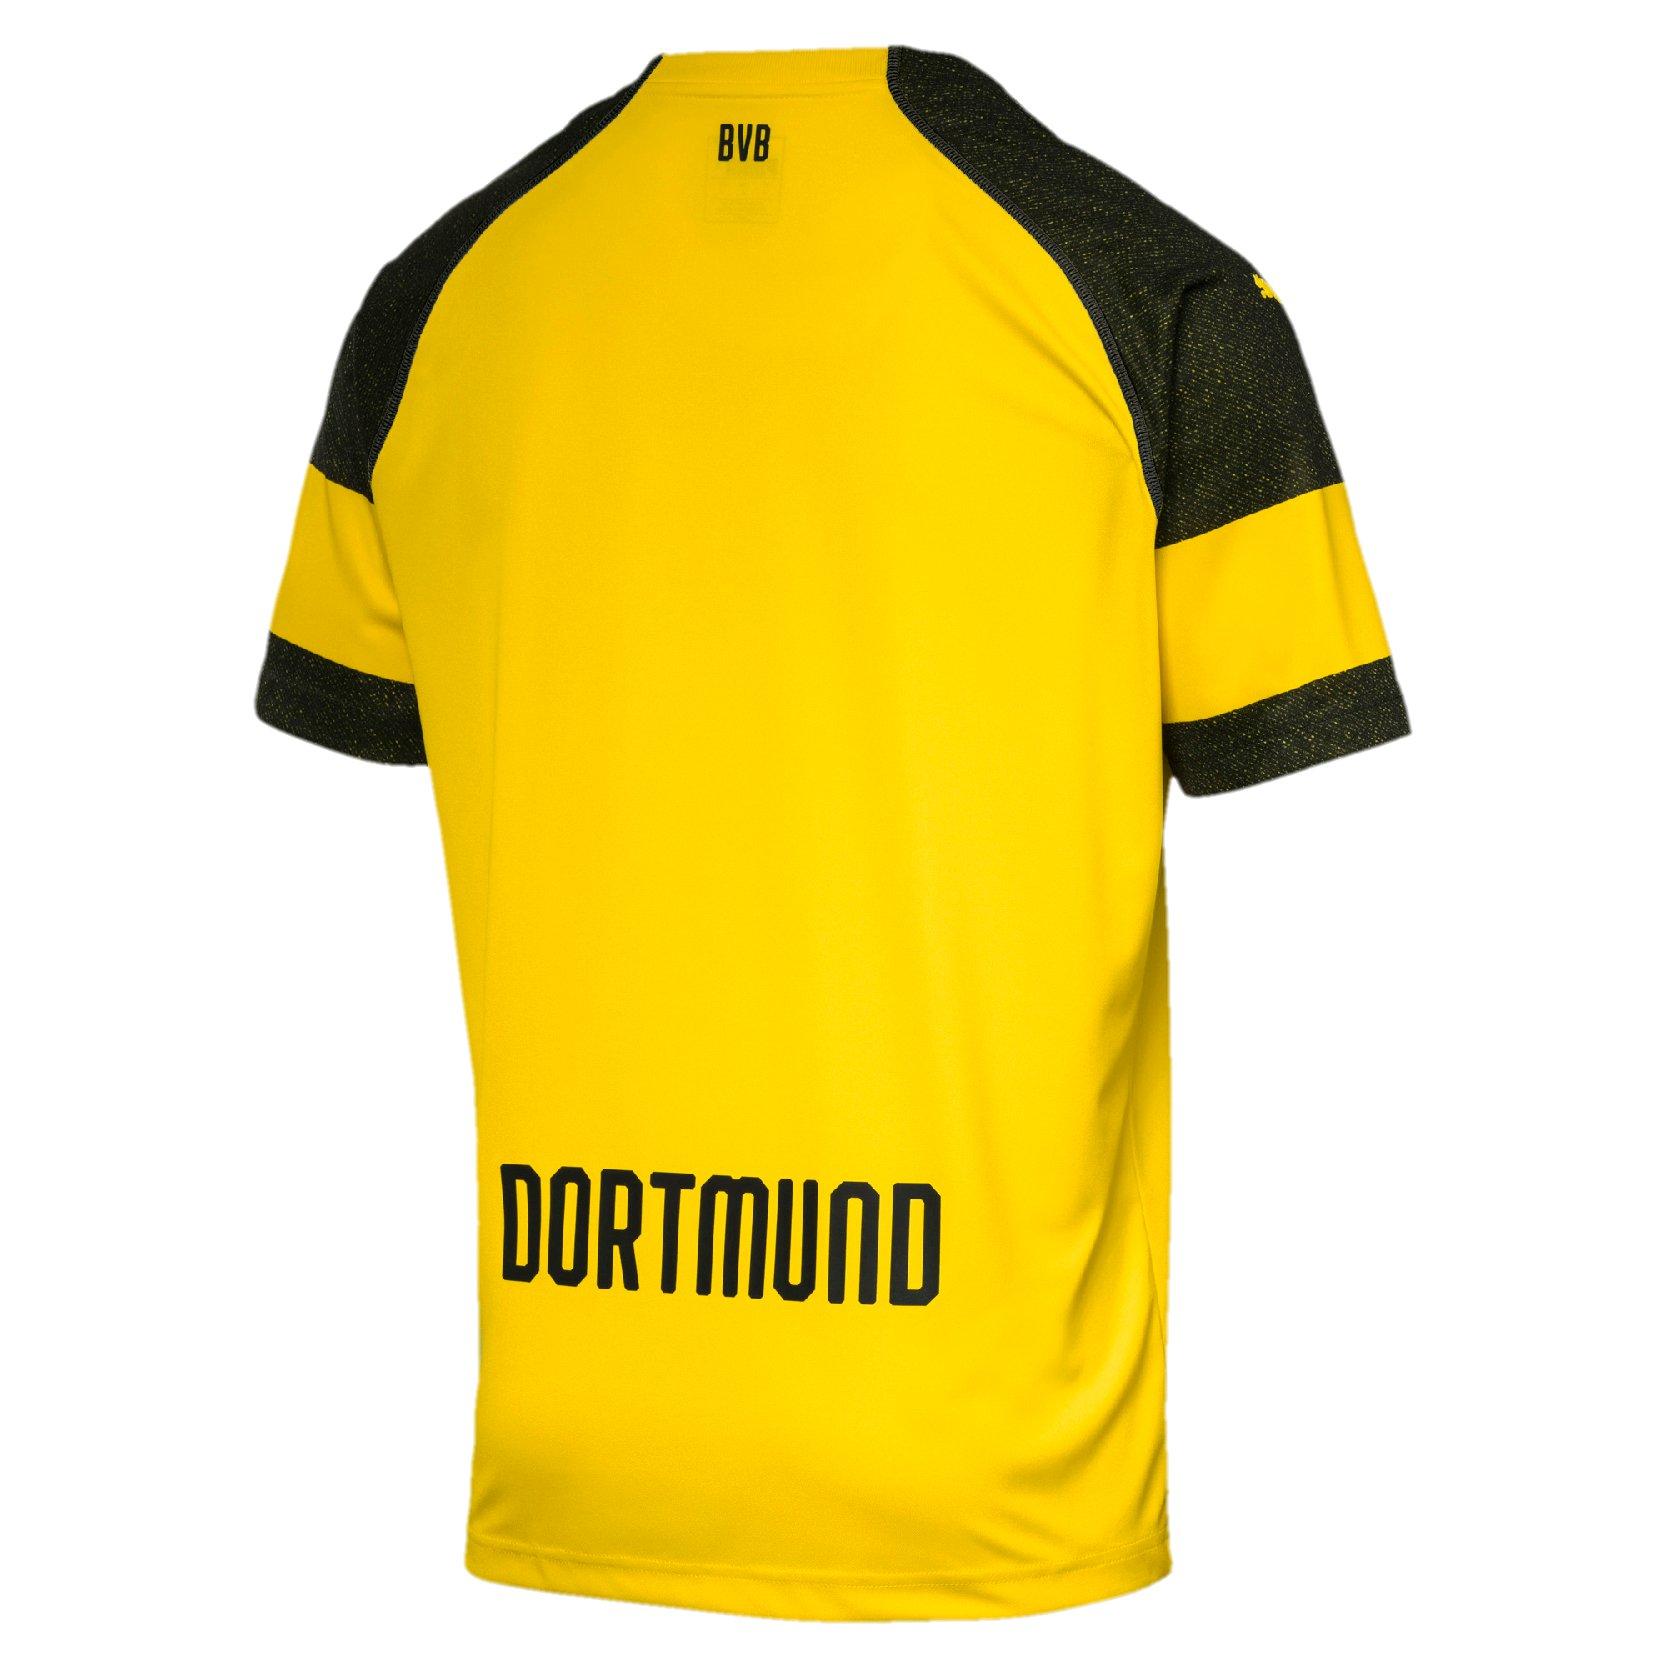 Dortmund Borussia Amarelo Home s Puma 19 Infantil Torcedor Camisa 18 n° qHT5EPvw